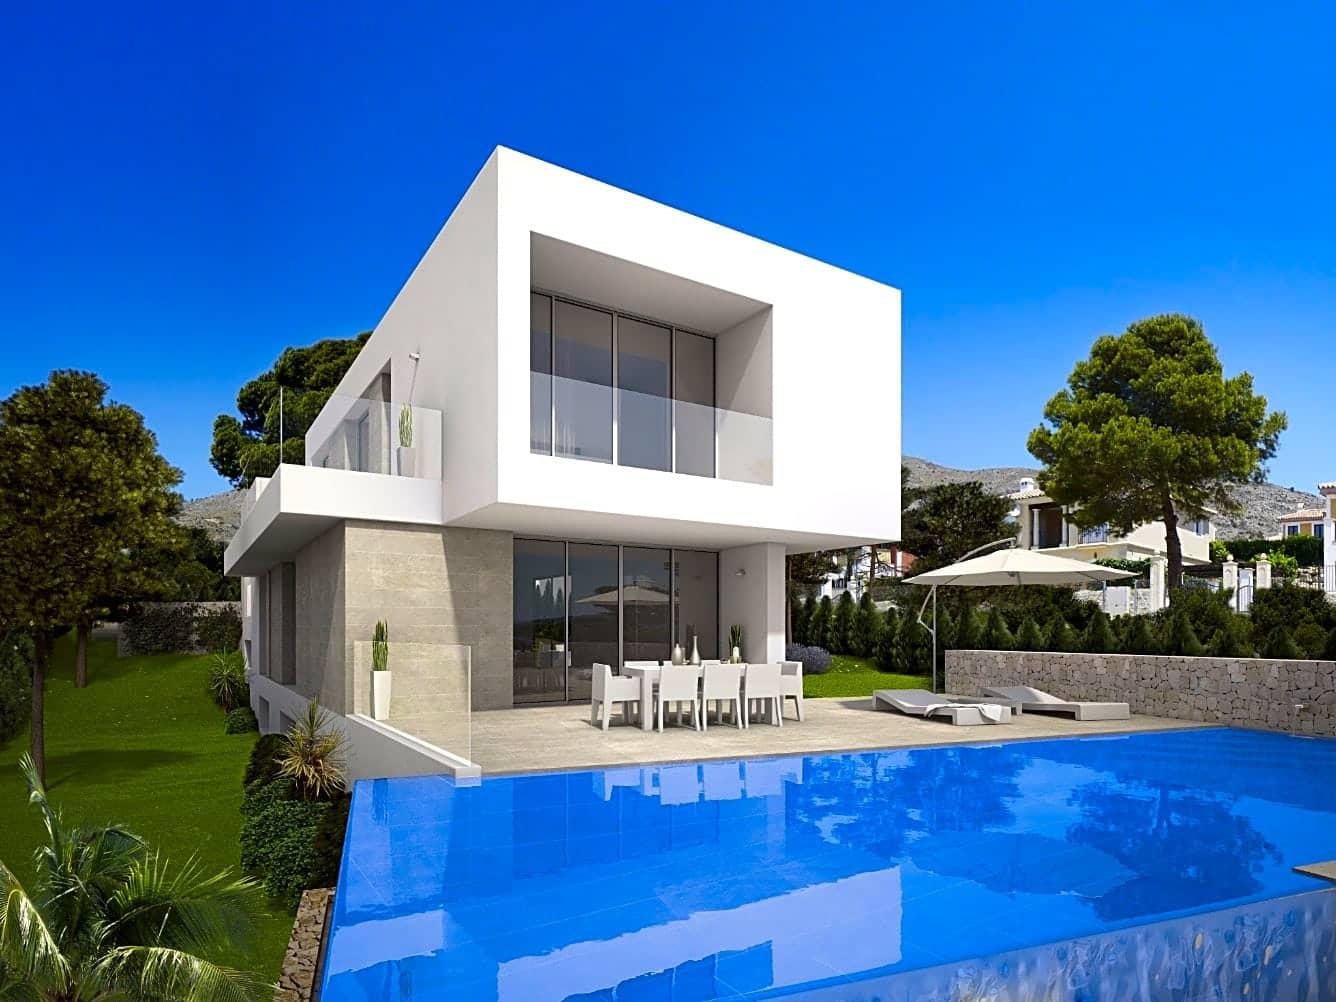 3 bedroom Villa for sale in Cala de Finestrat - € 990,000 (Ref: 4005149)